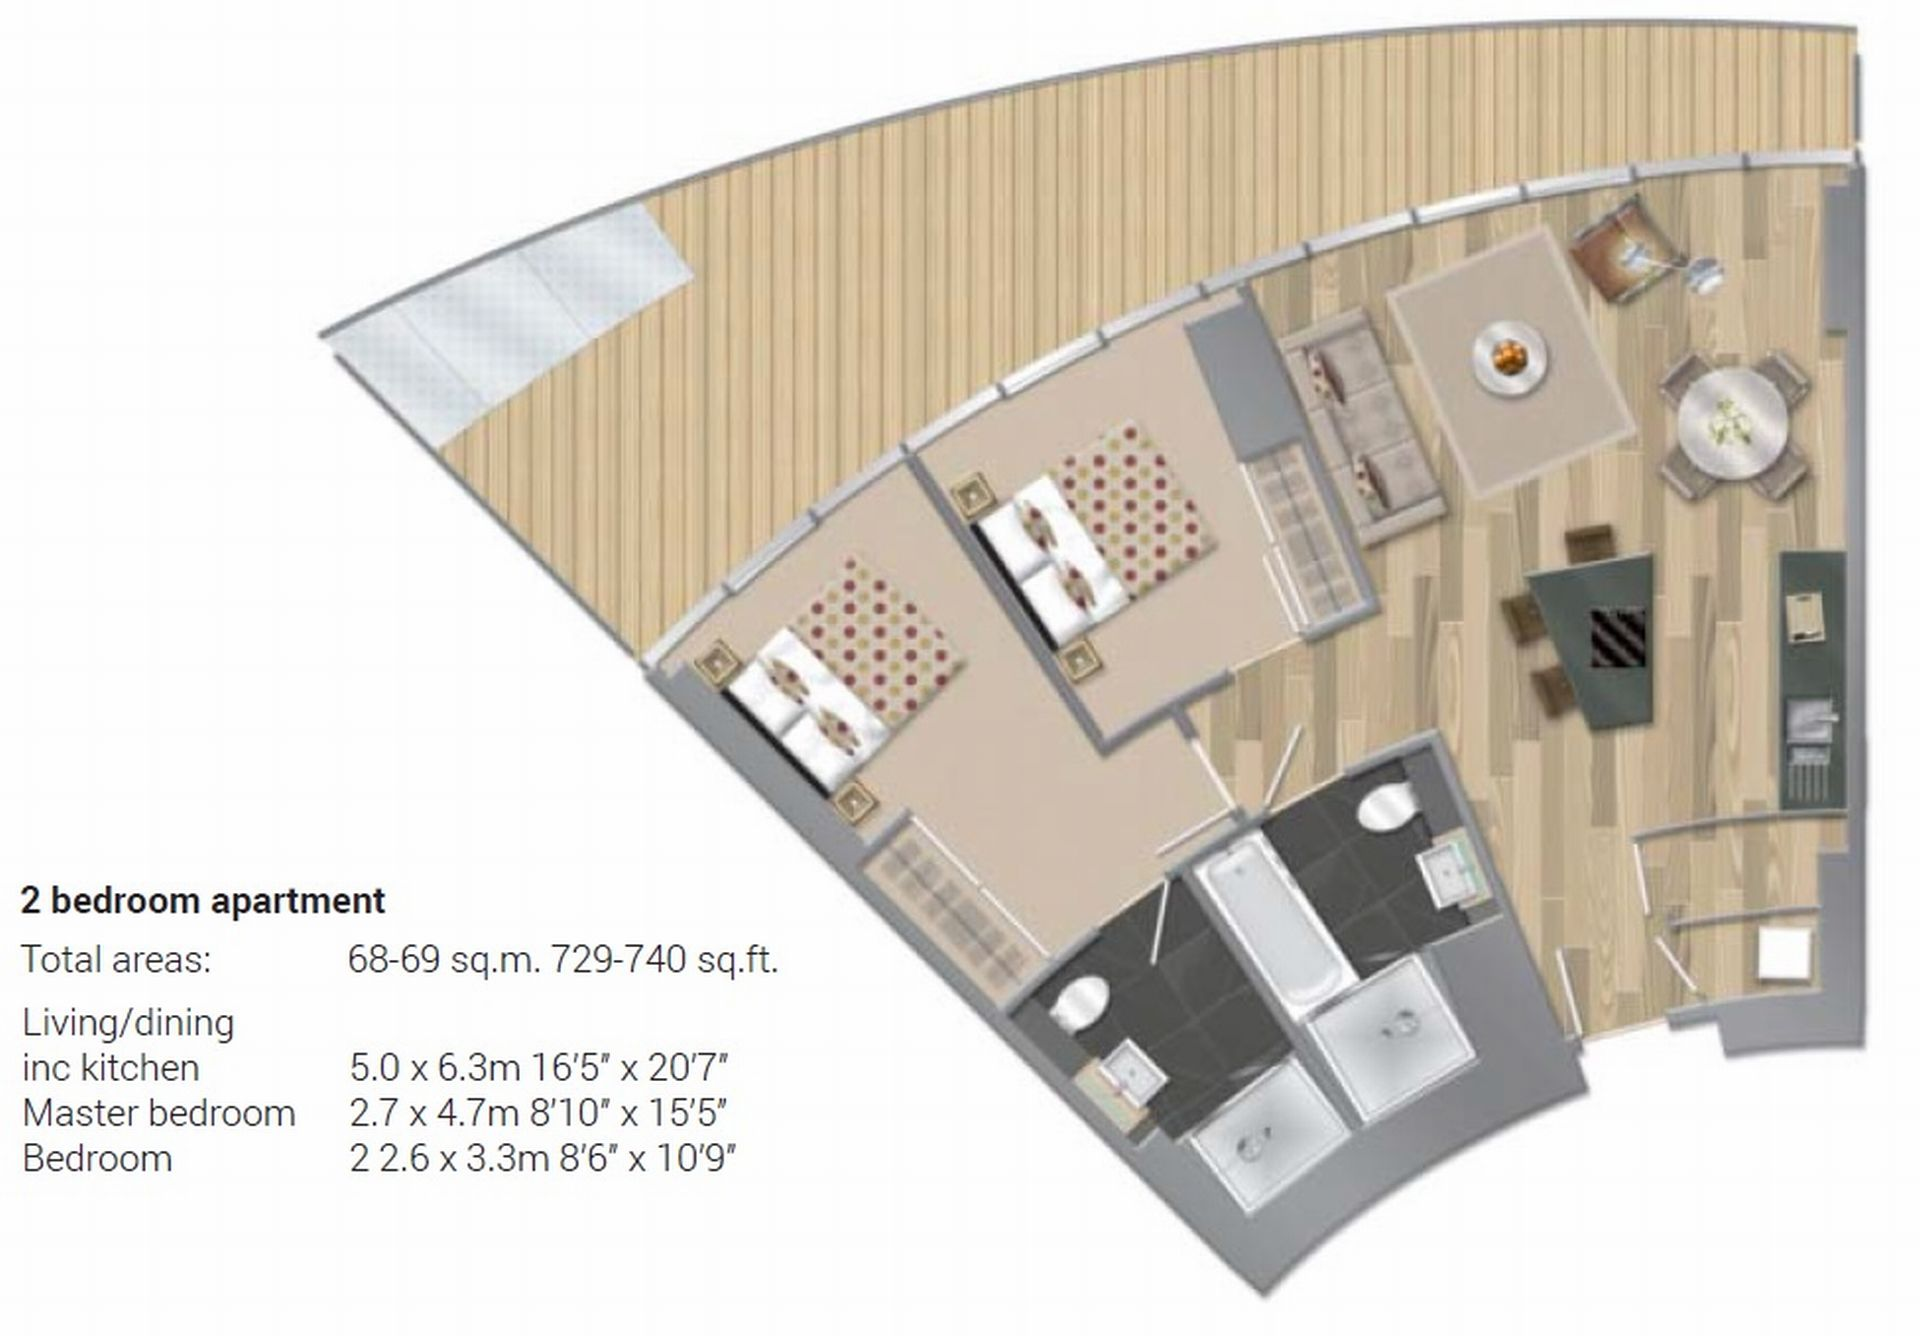 Arena Tower, 25 Crossharbour Plaza, Canary Wharf, London, E14